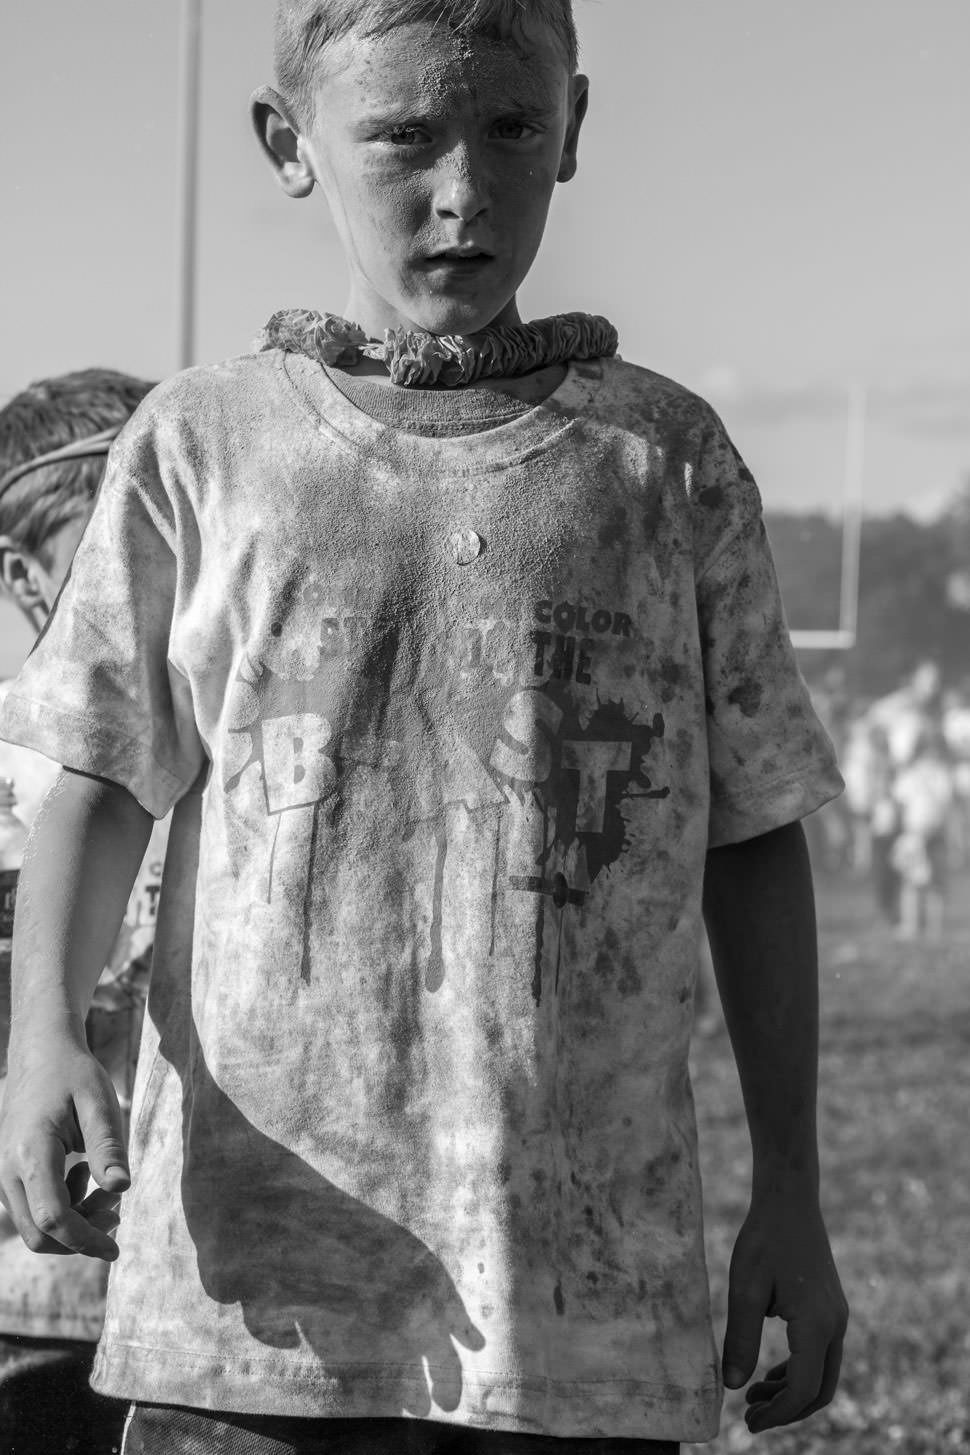 BW Color Run kid